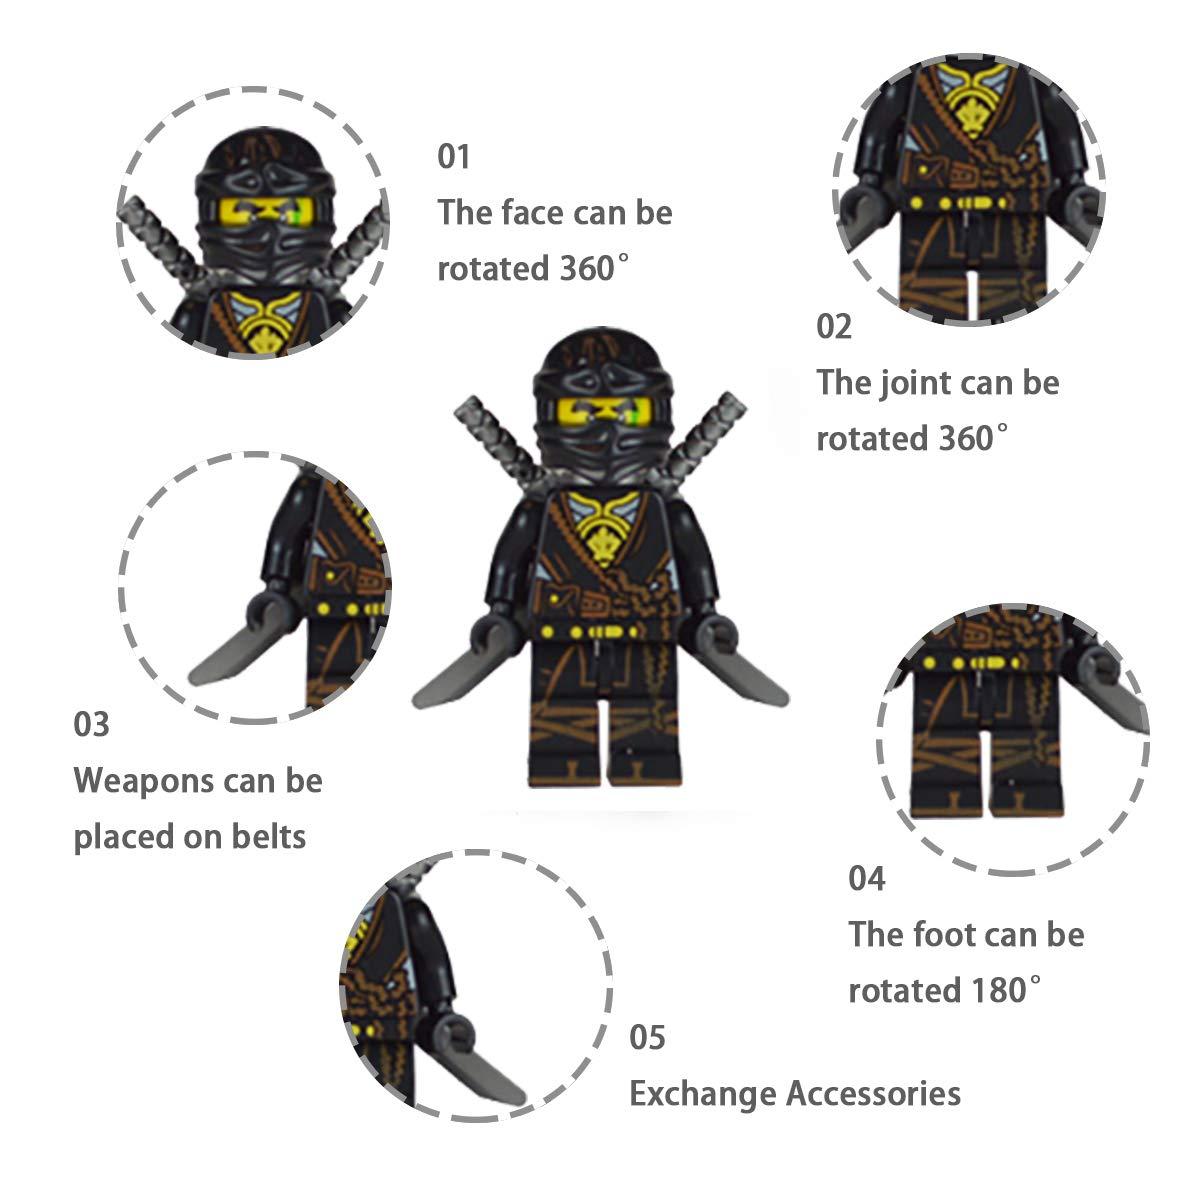 2 Tanks Building Bricks Ninja Figures Building Flash Chicken 20 Ninja Minifigures with Ninja Accessoies